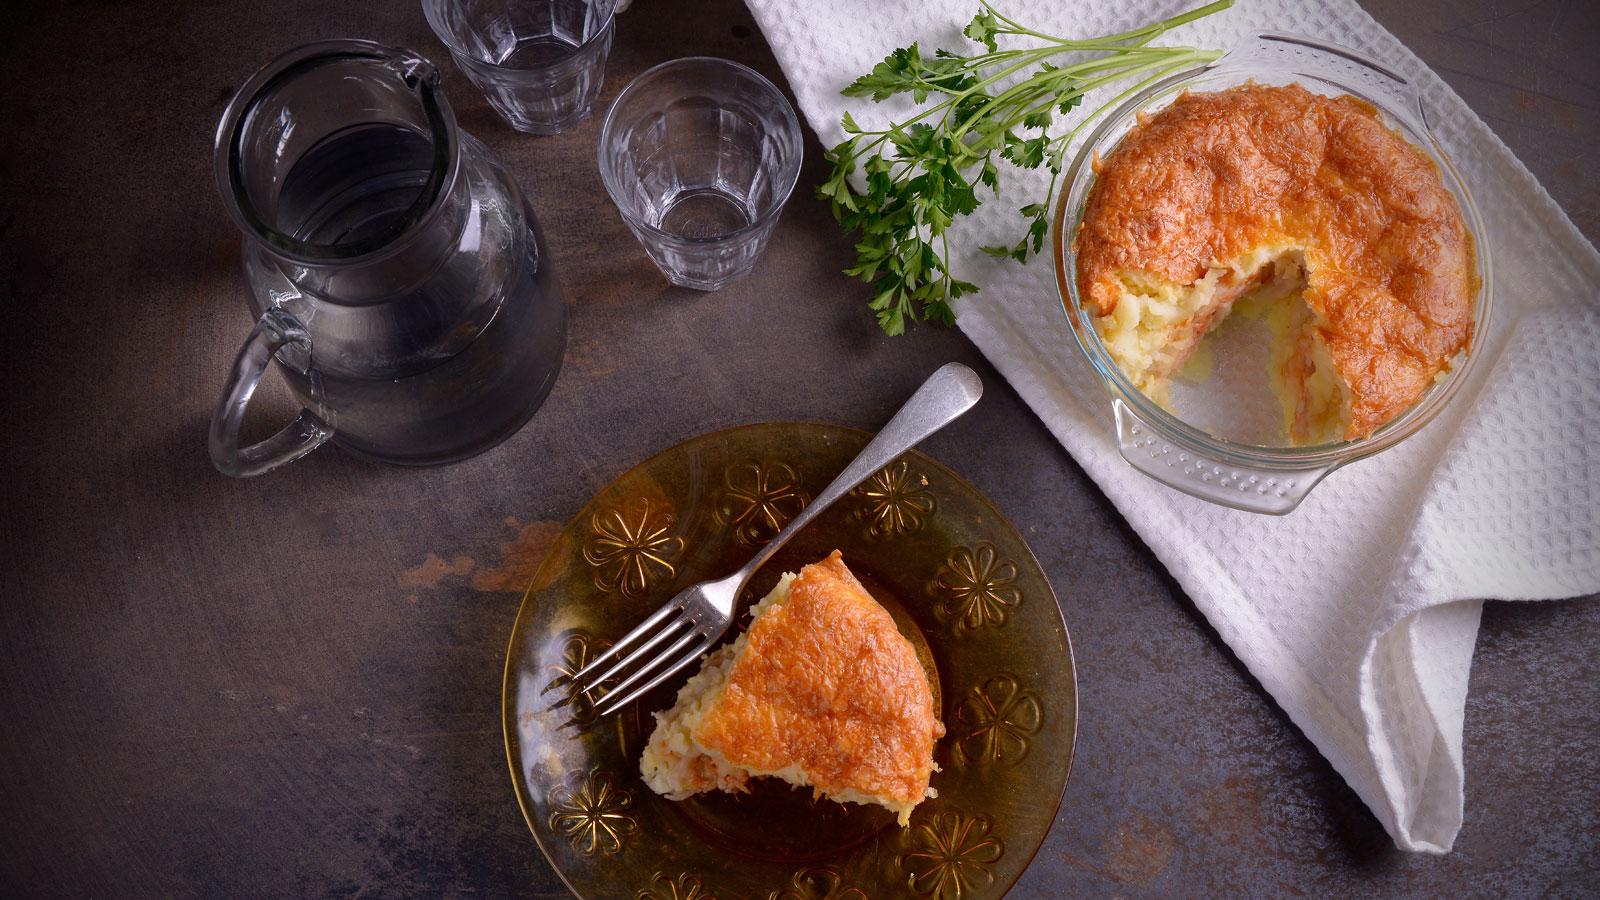 Pastel de bacalao hermana mar a jos receta canal cocina - Divinos pucheros maria jose ...